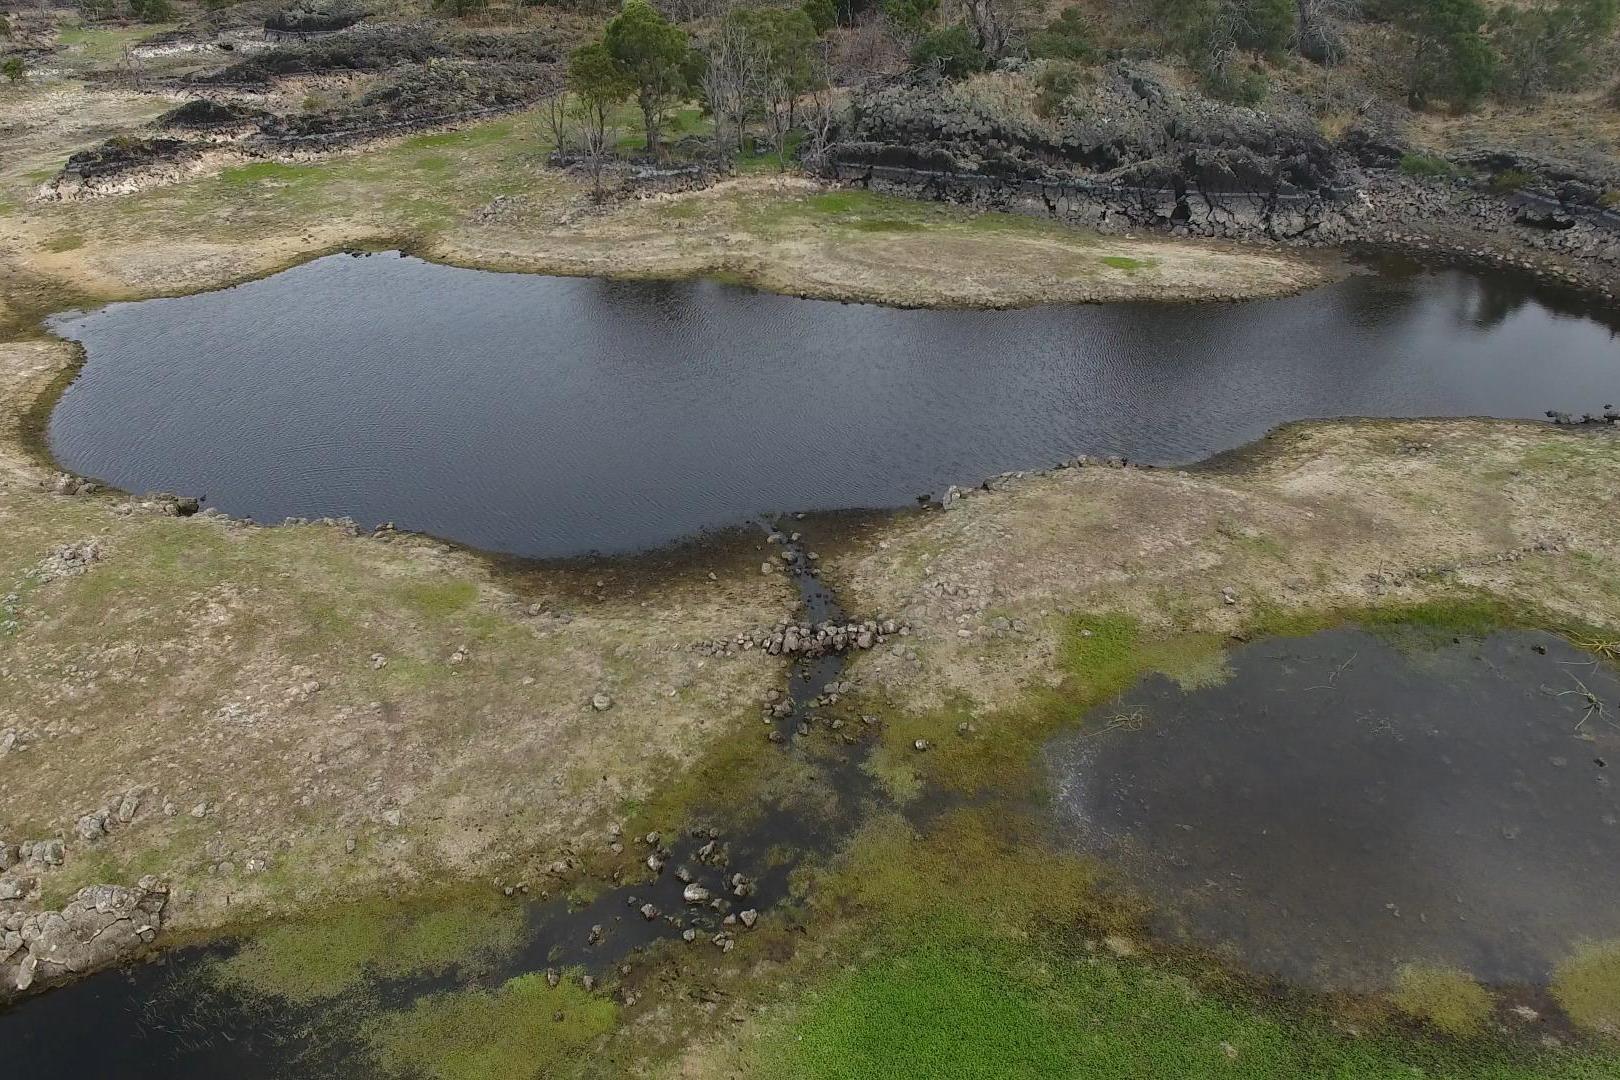 Australia wildfires reveal ancient aboriginal aquaculture system bui…